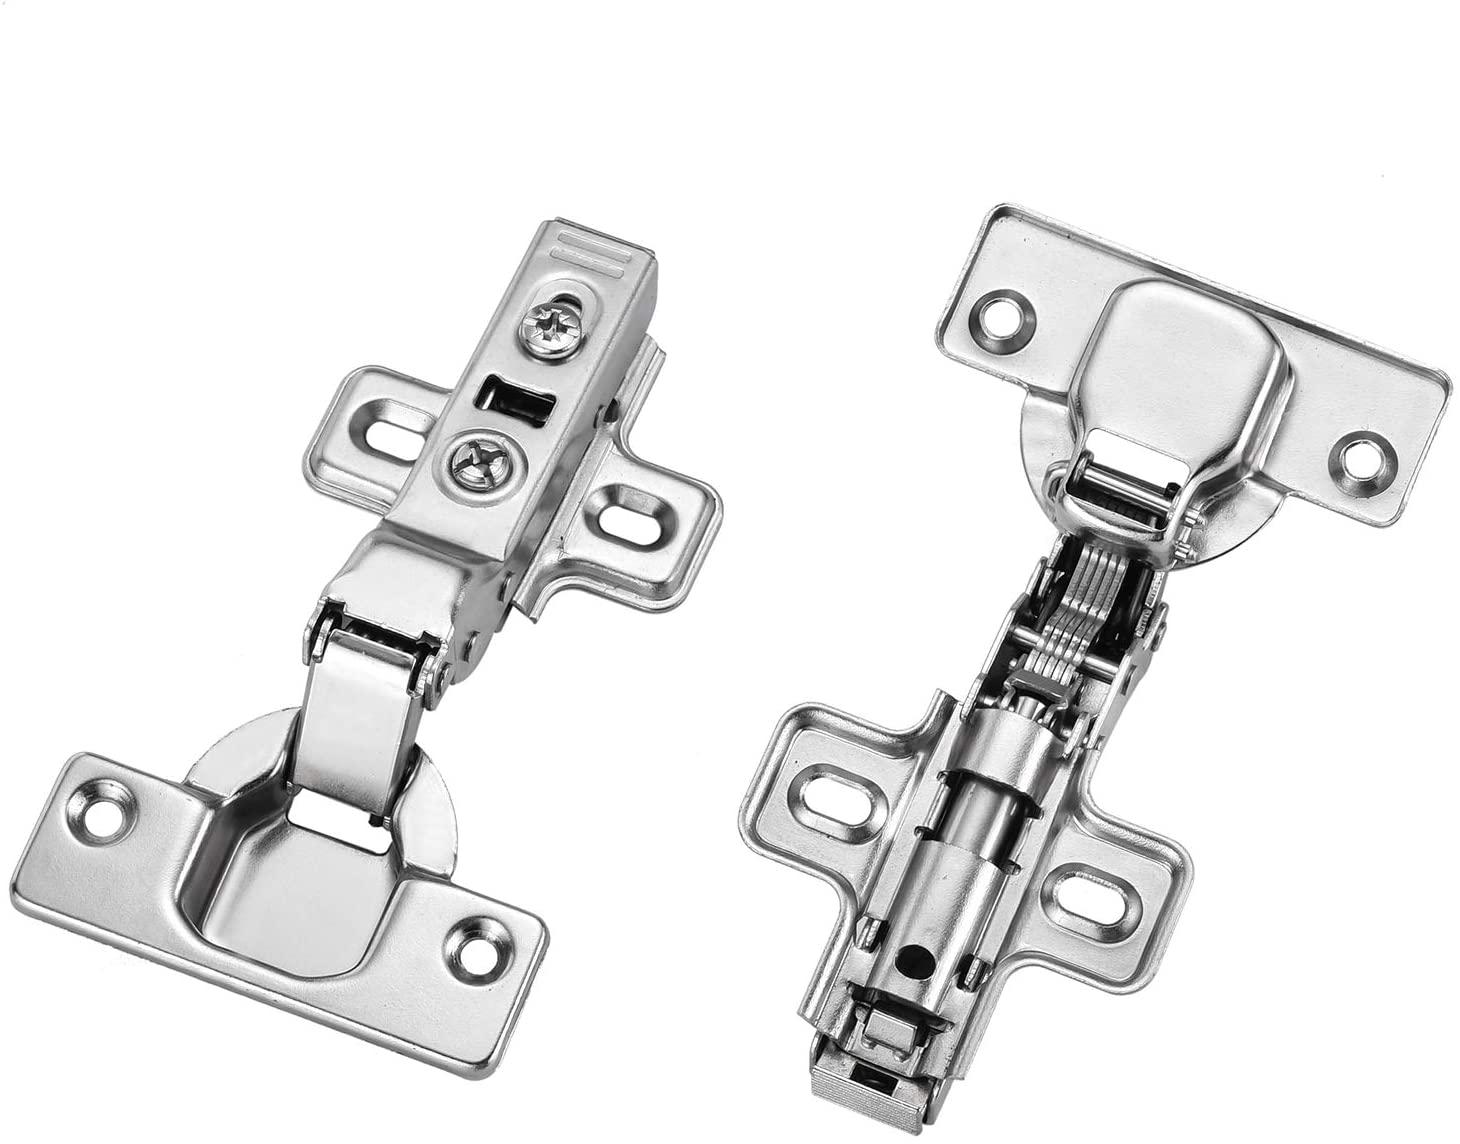 Homekoo Concealed Frameless Hinge Bathroom Built in Cabinets Half Overlay Soft-Closing Nickel Plated 2PCS